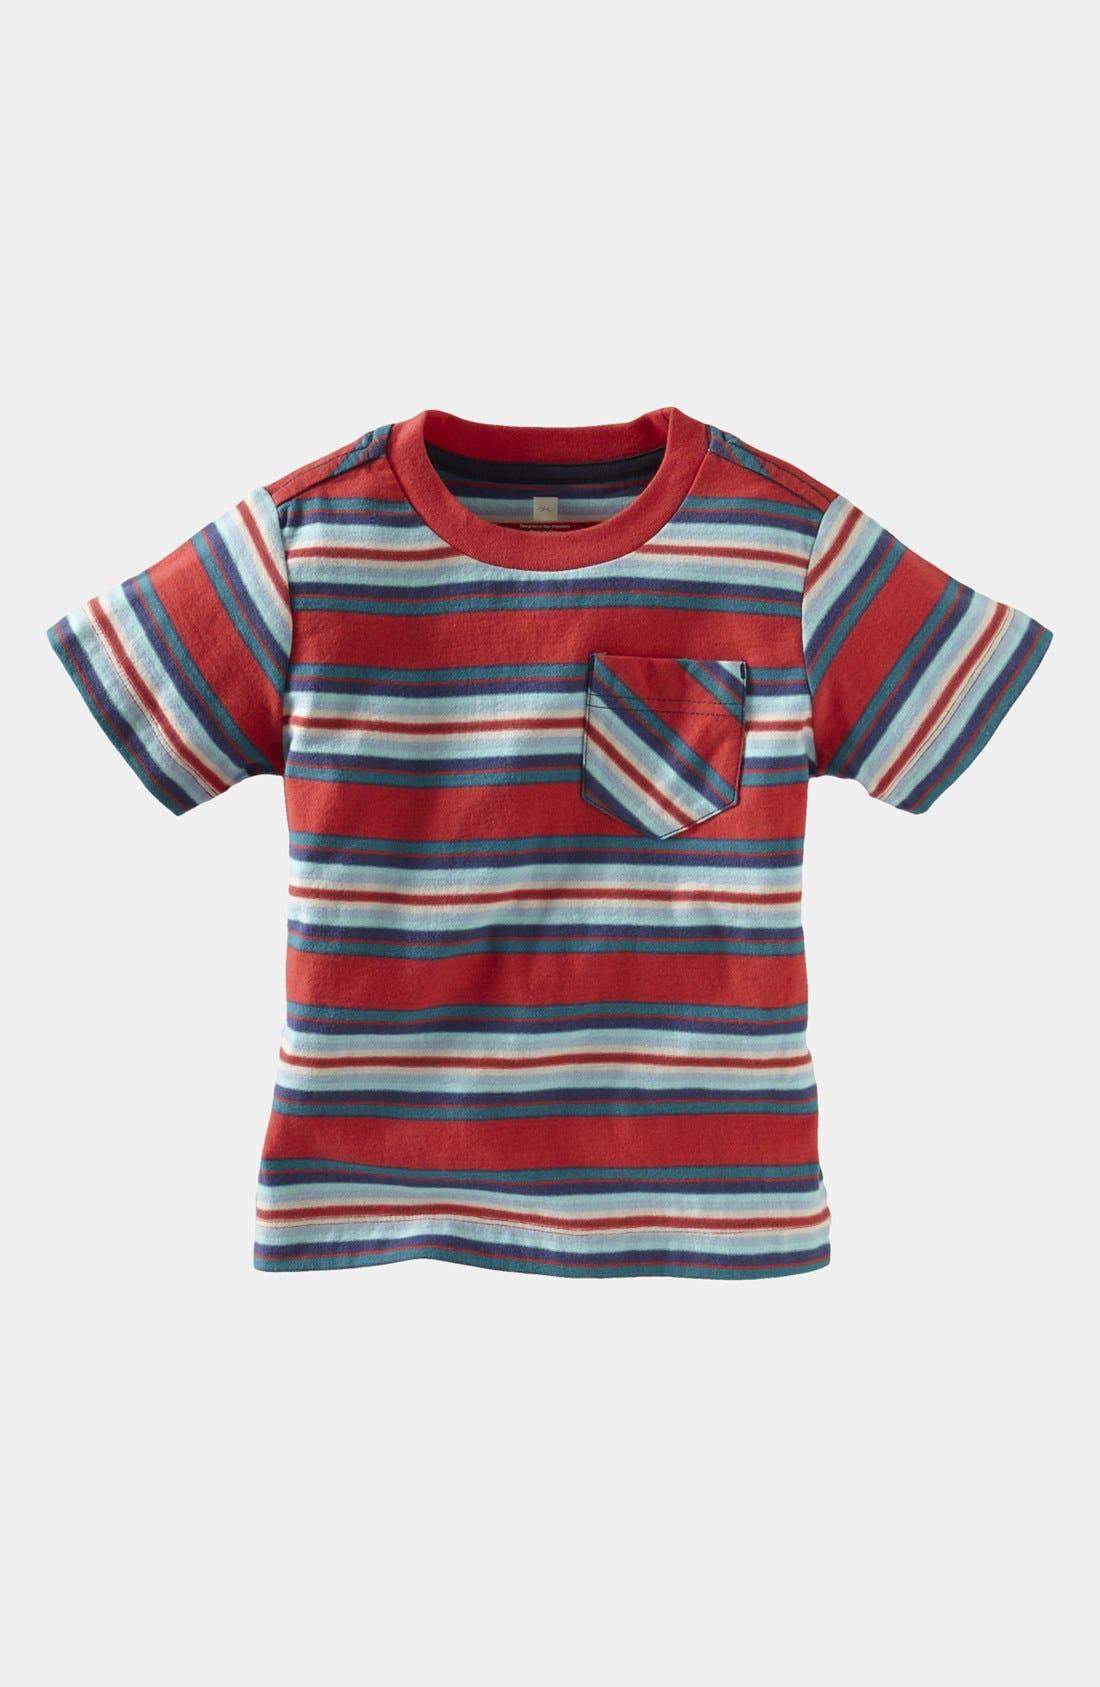 Alternate Image 1 Selected - Tea Collection 'Venda' Stripe T-Shirt (Toddler)